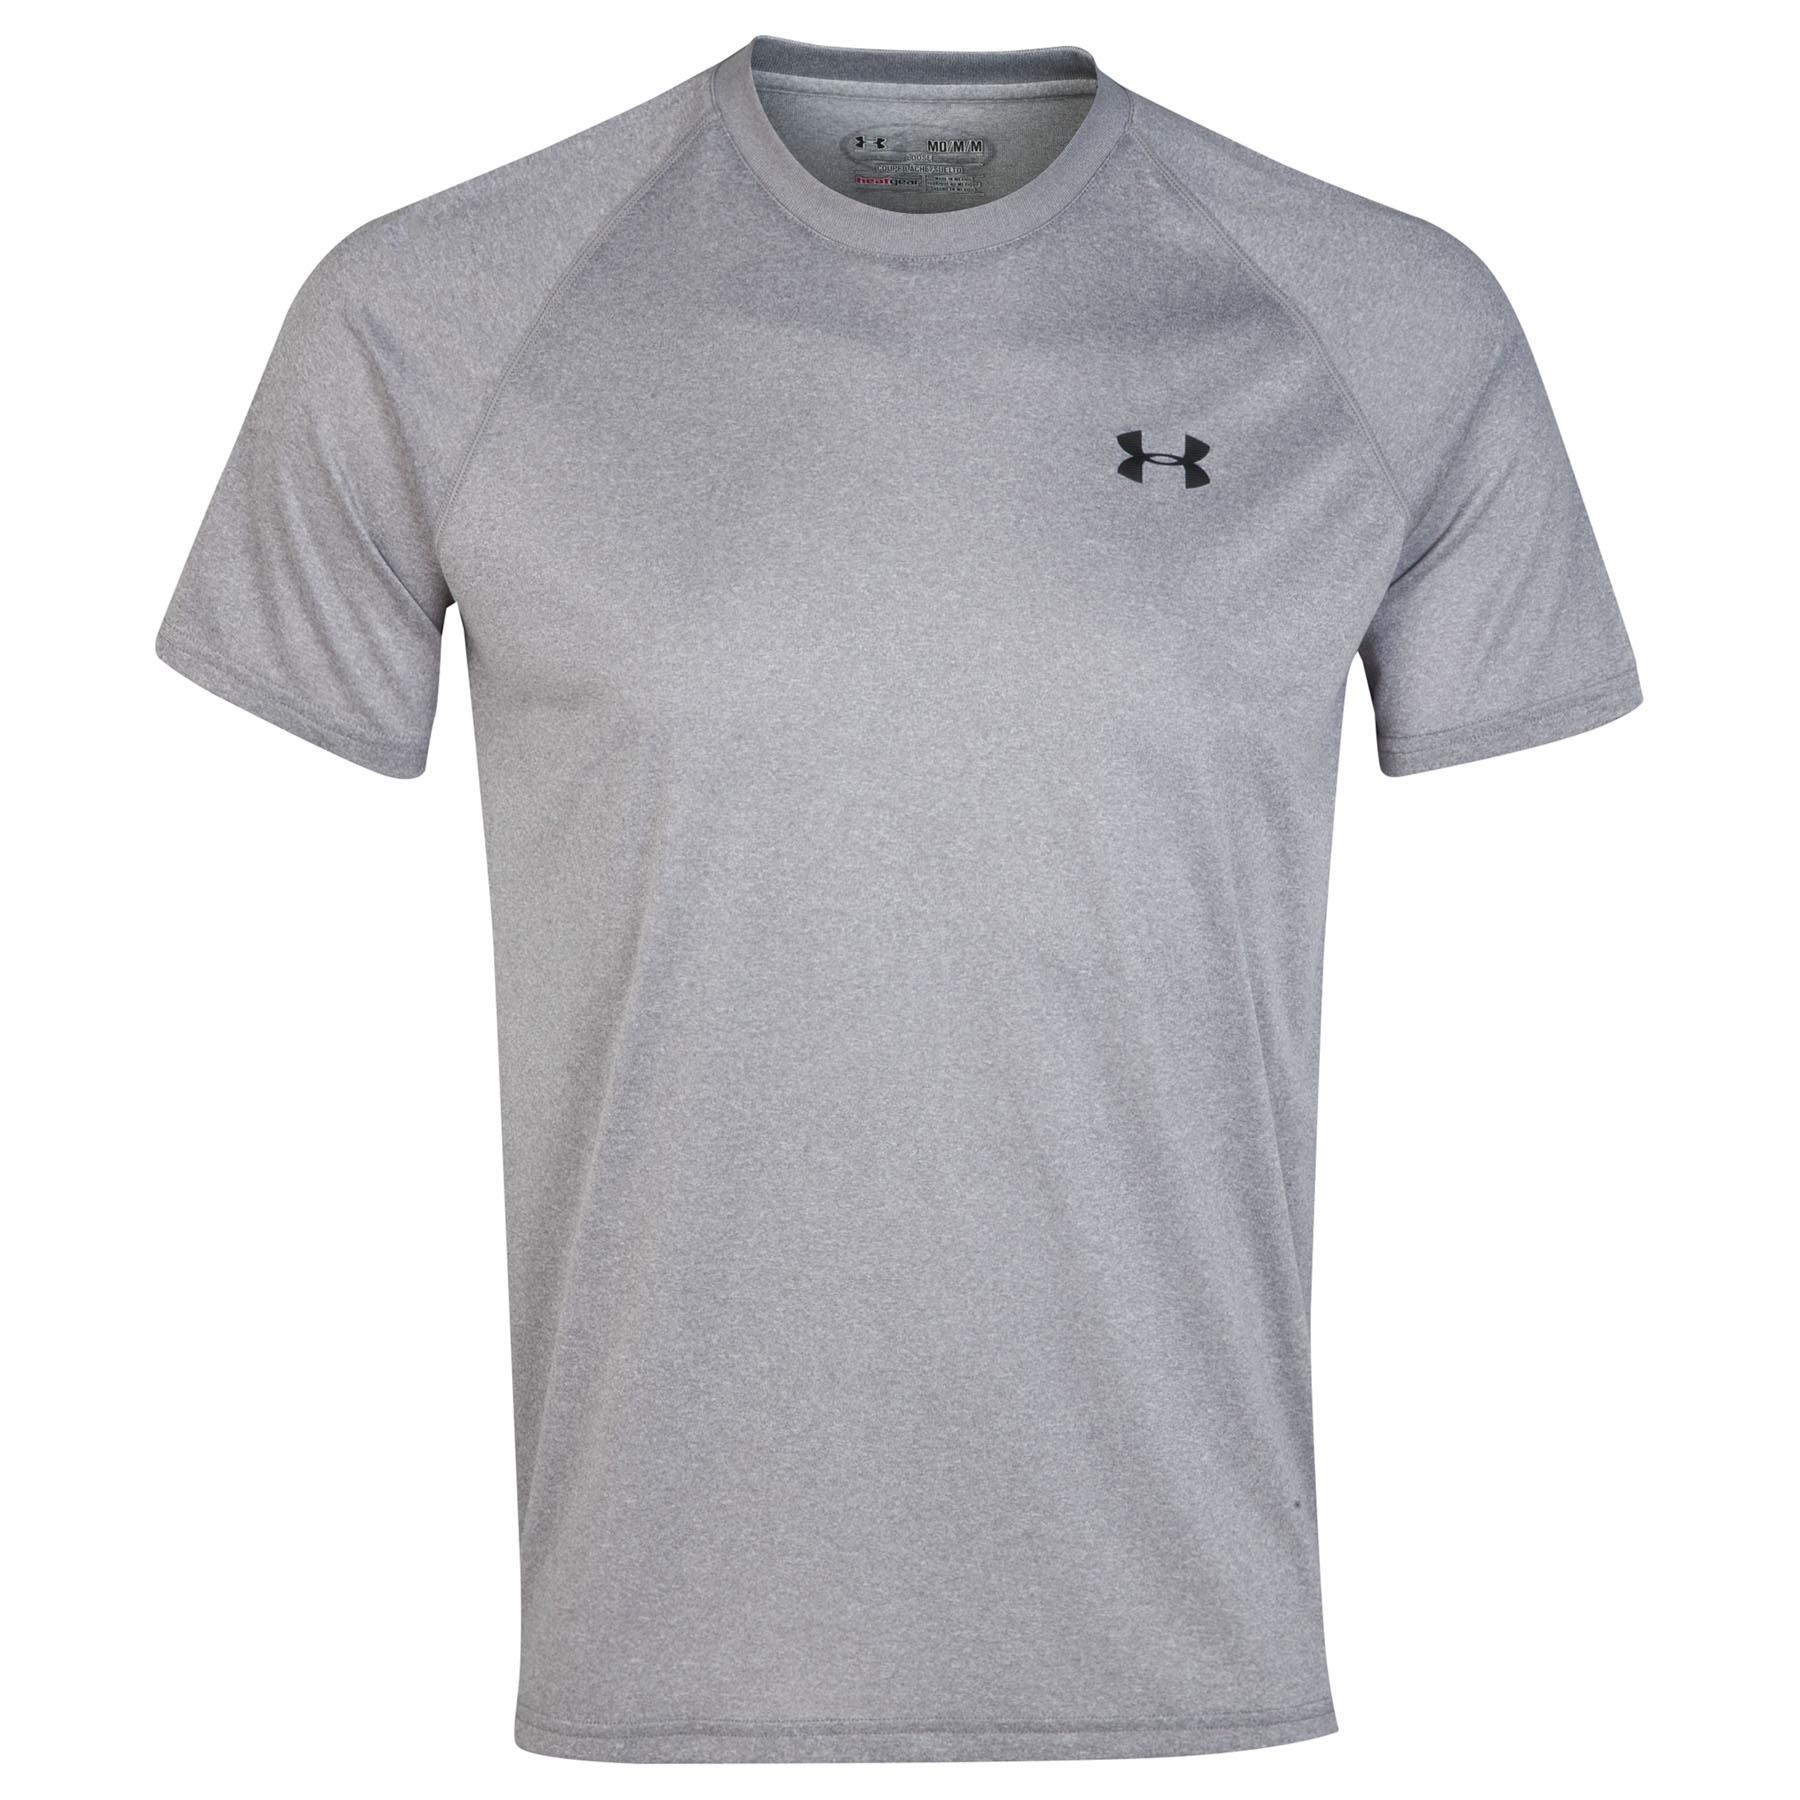 Under Armour Tech T-Shirt Charcoal